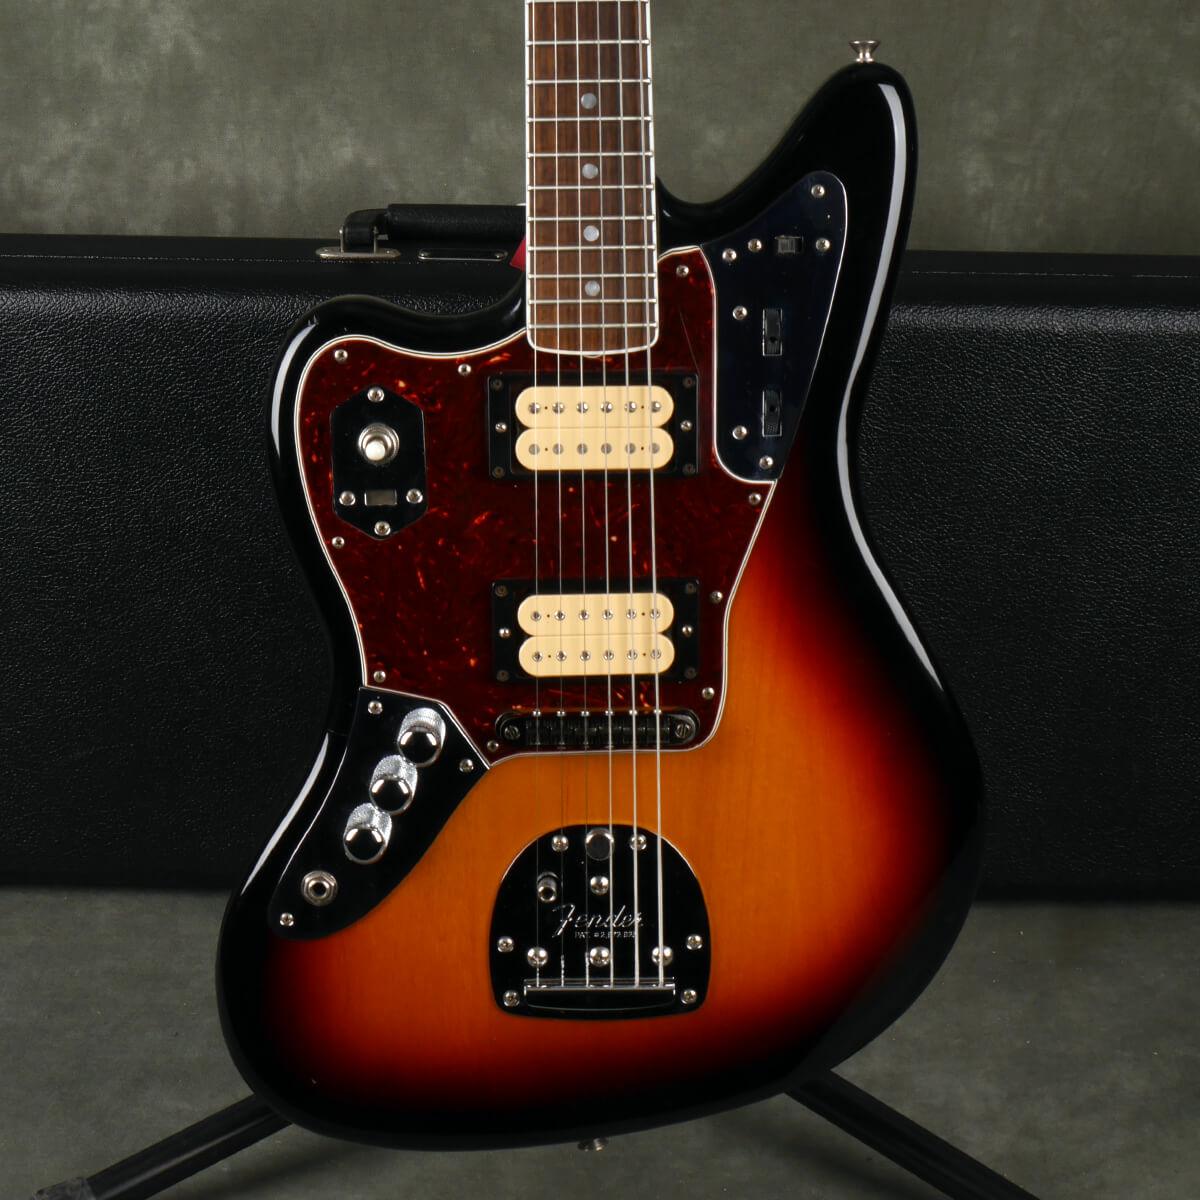 Fender Kurt Cobain Jaguar NOS - Left Handed - Sunburst w/Hard Case - 2nd Hand